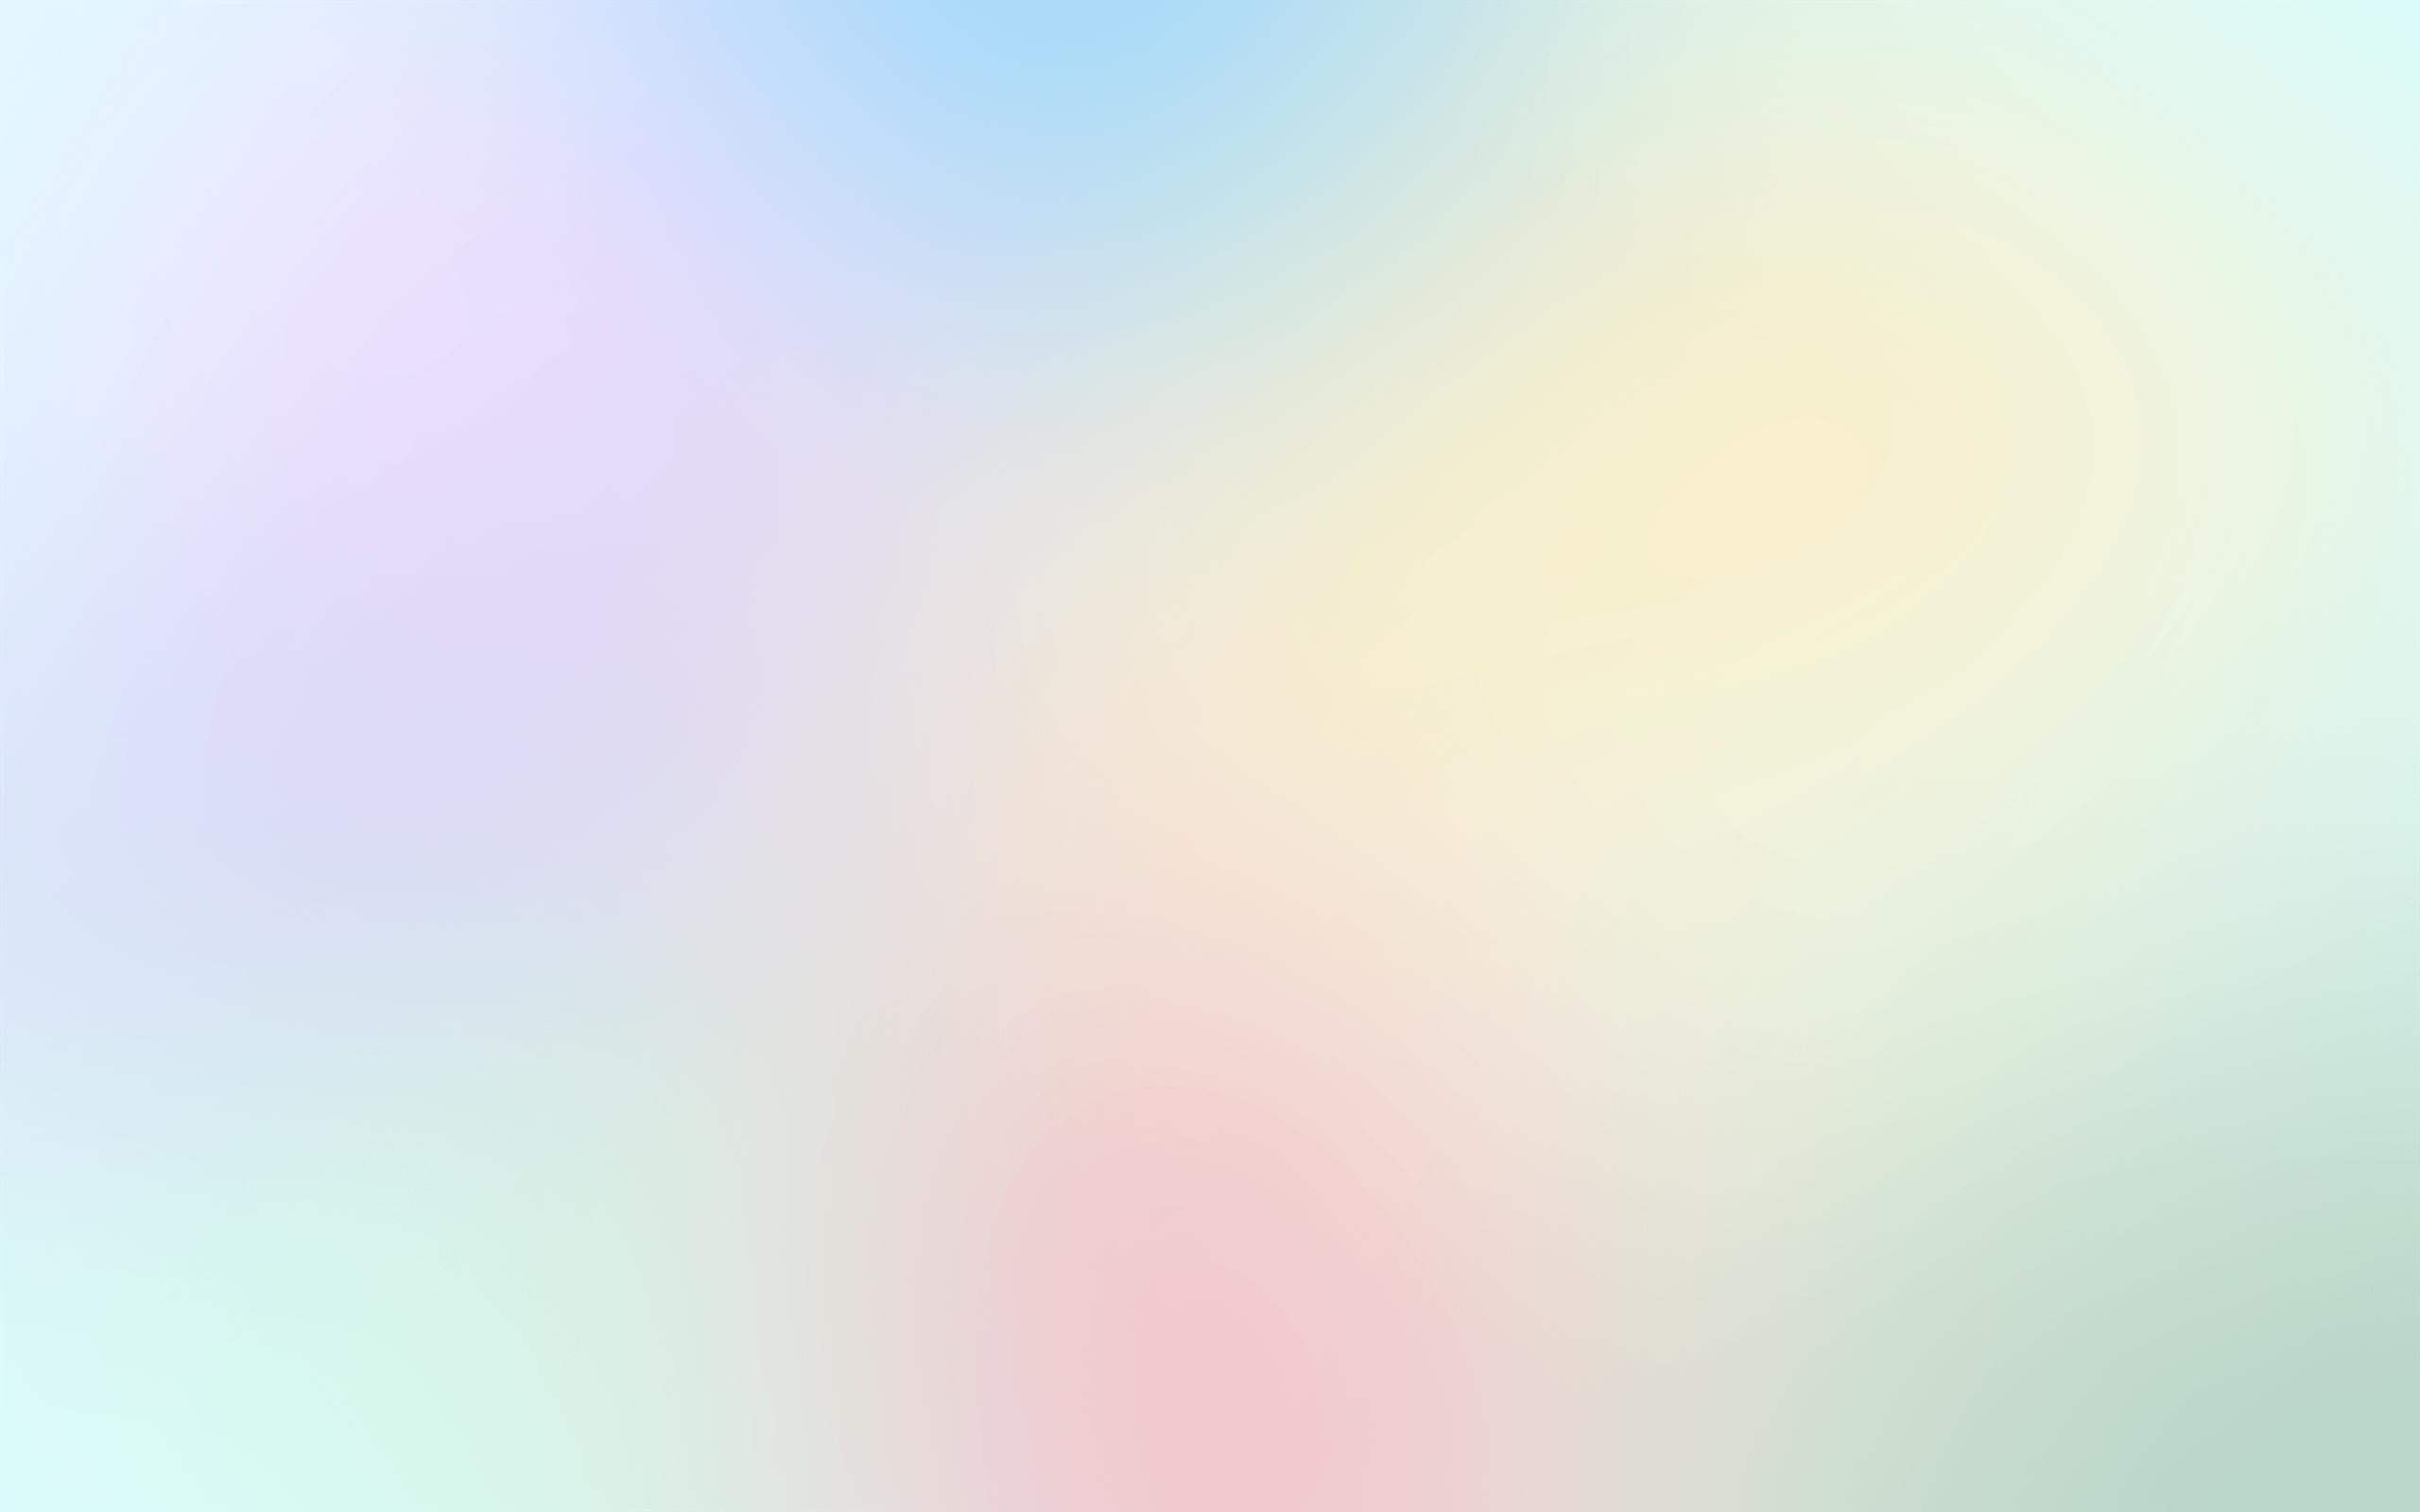 Pastel Gradient Wallpapers - Top Free Pastel Gradient ...